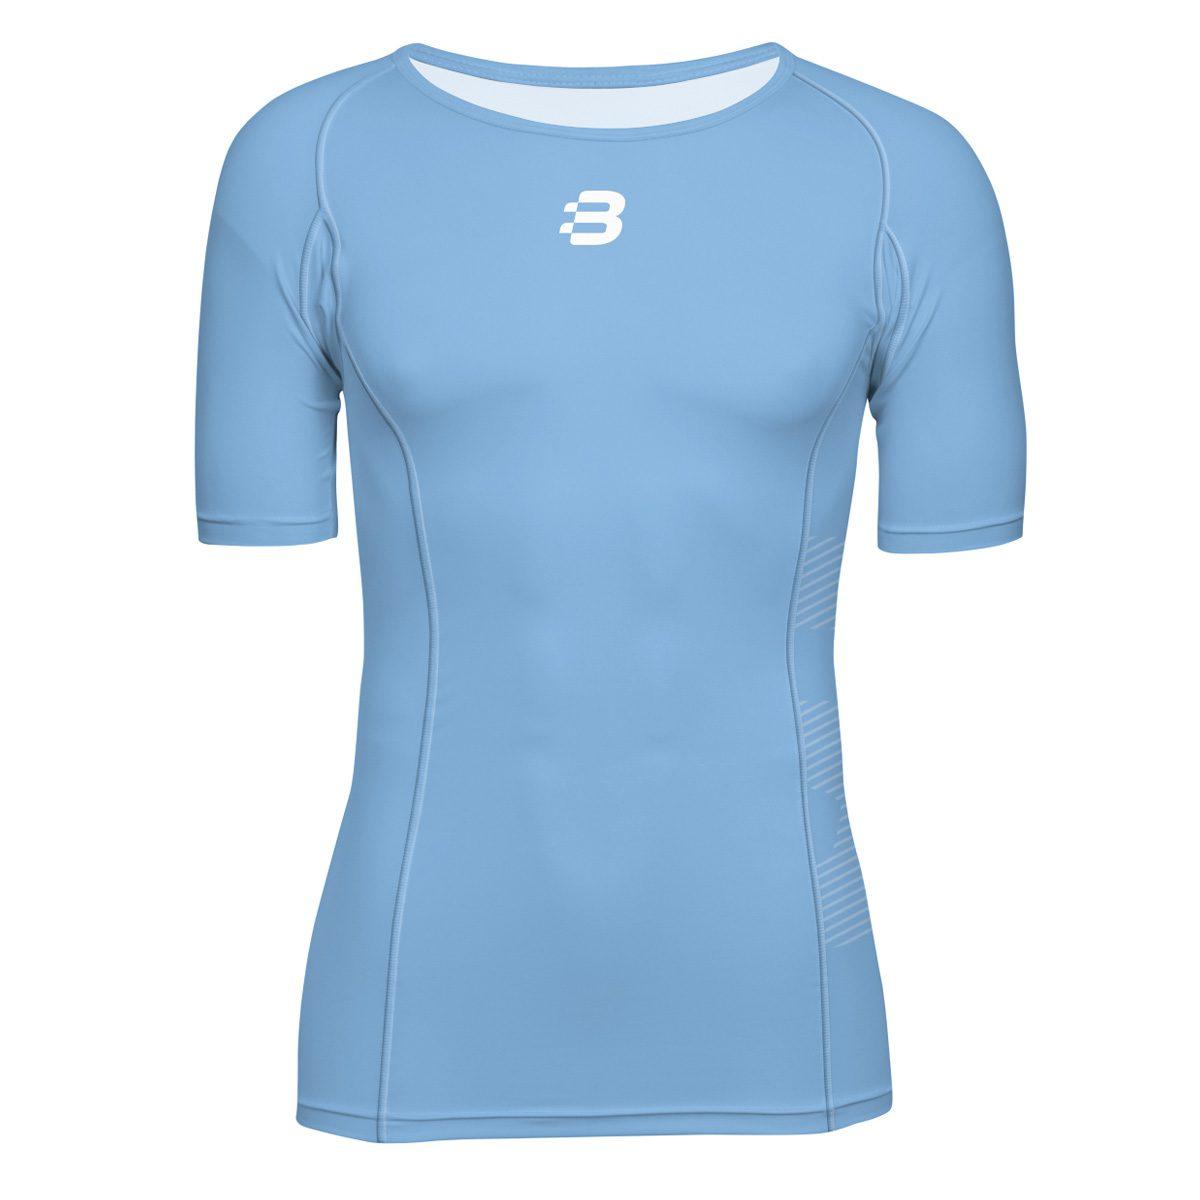 Mens compression t shirt sky blue blackchrome for Compression tee shirts for men